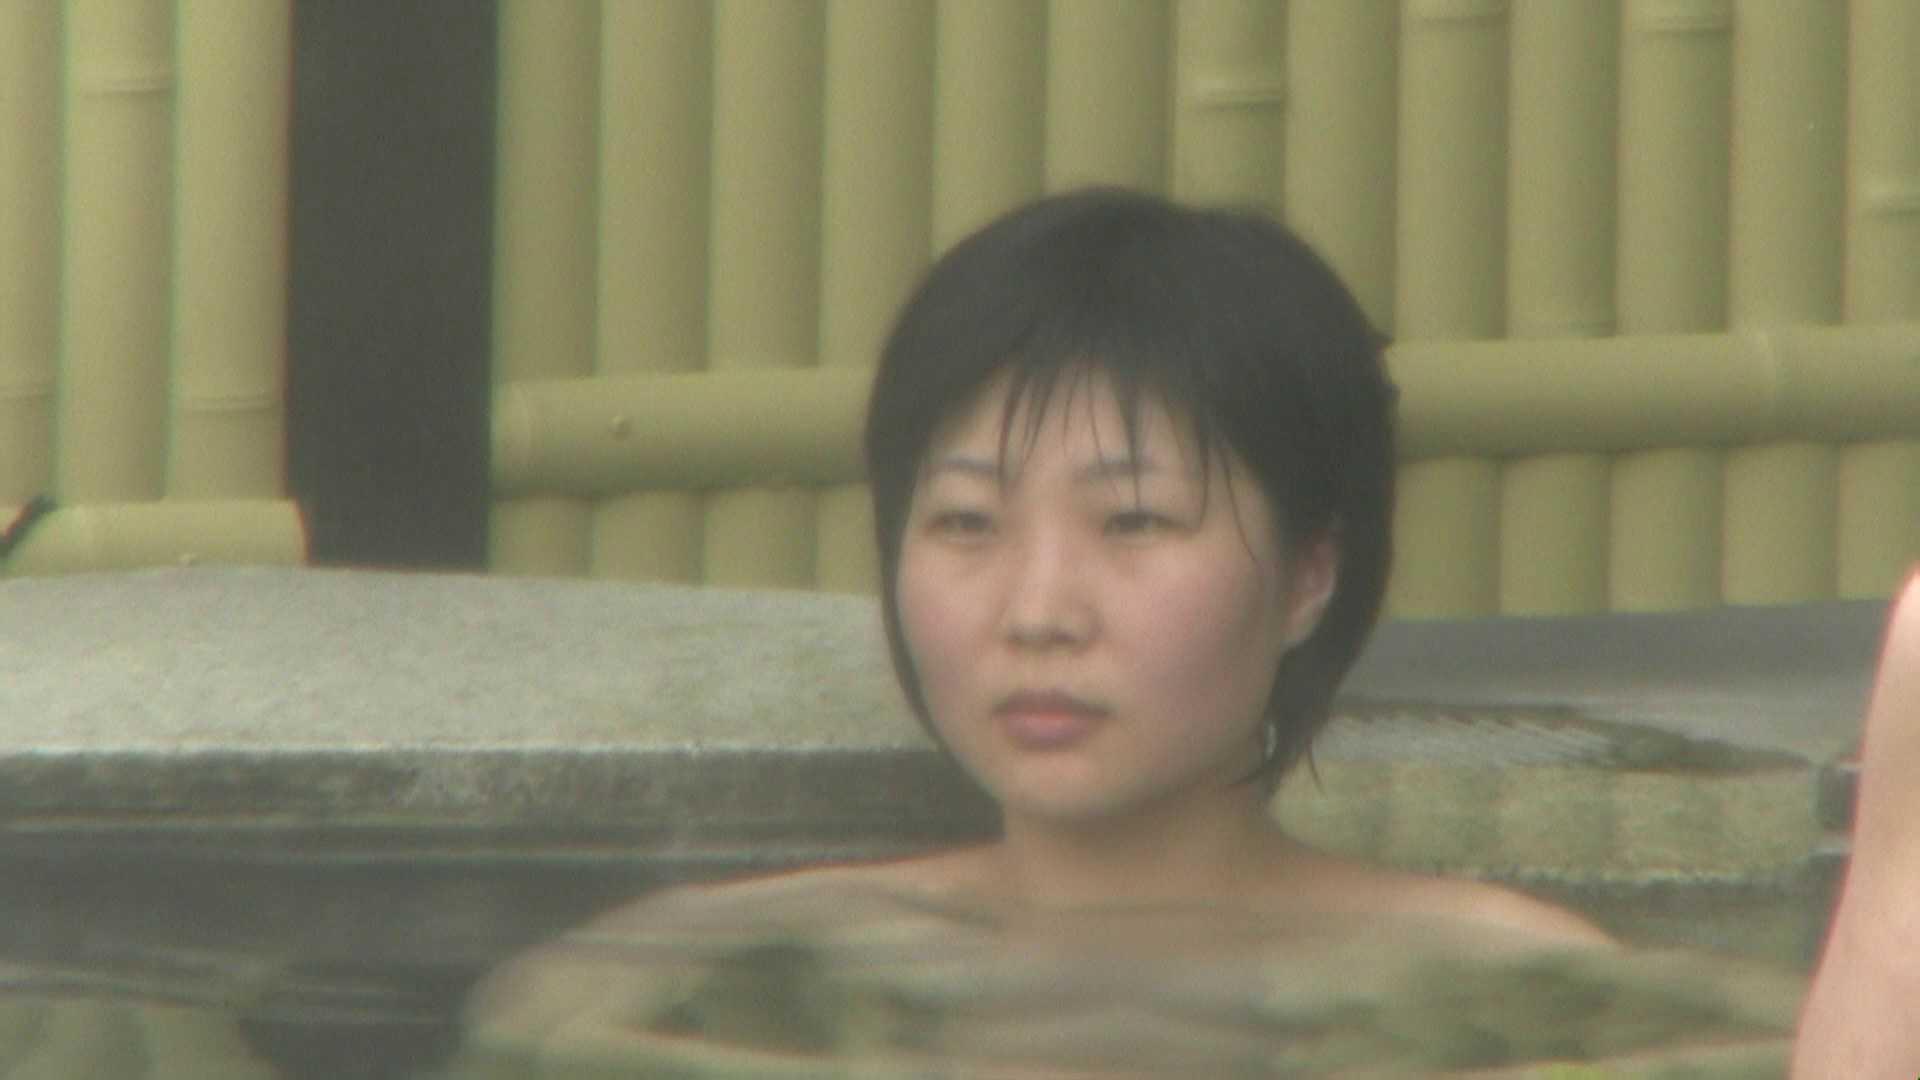 Aquaな露天風呂Vol.74【VIP限定】 OLセックス  68画像 51